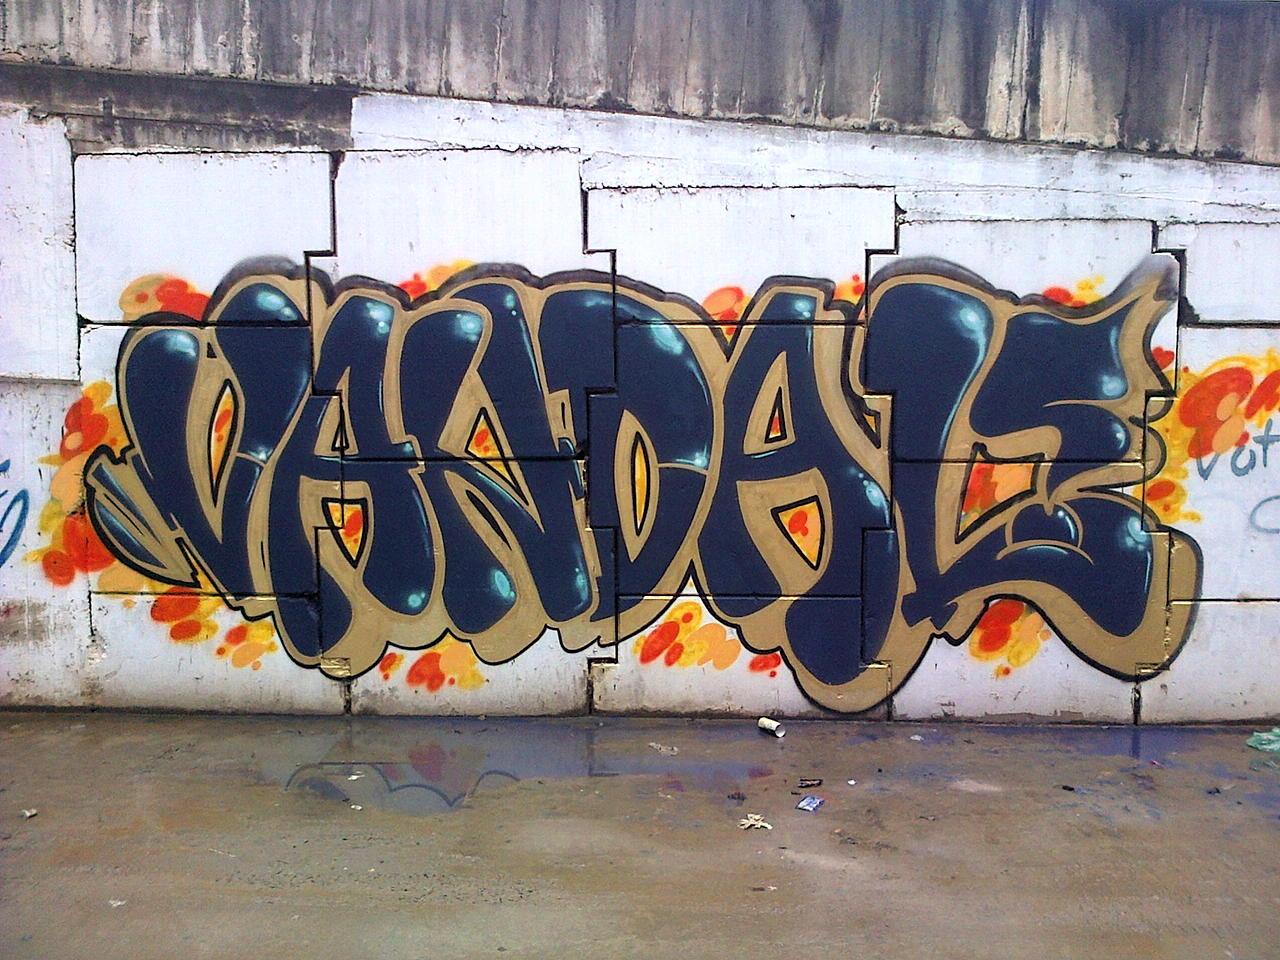 definition of vandalism